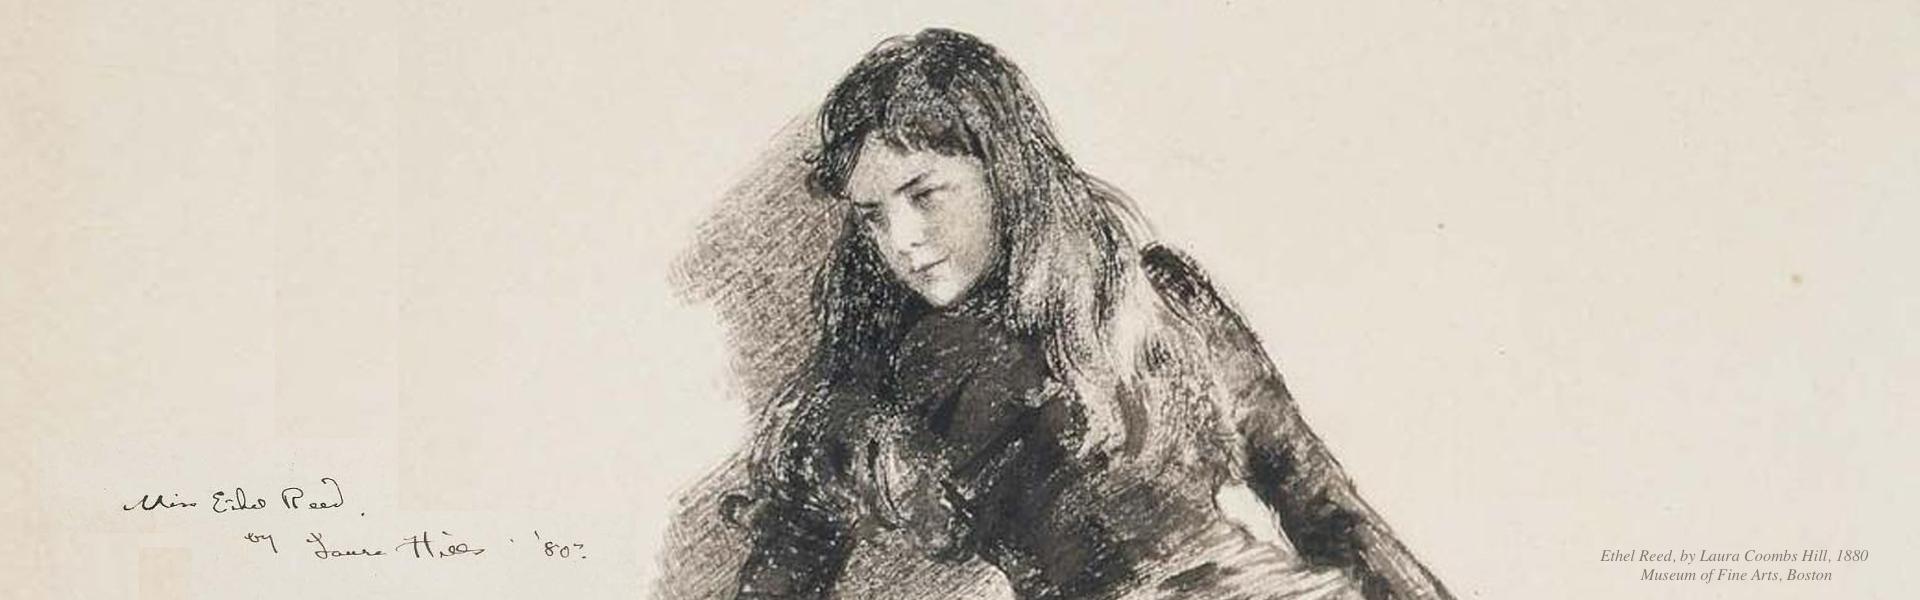 Drawing of Ethel Reed Newburyport MA